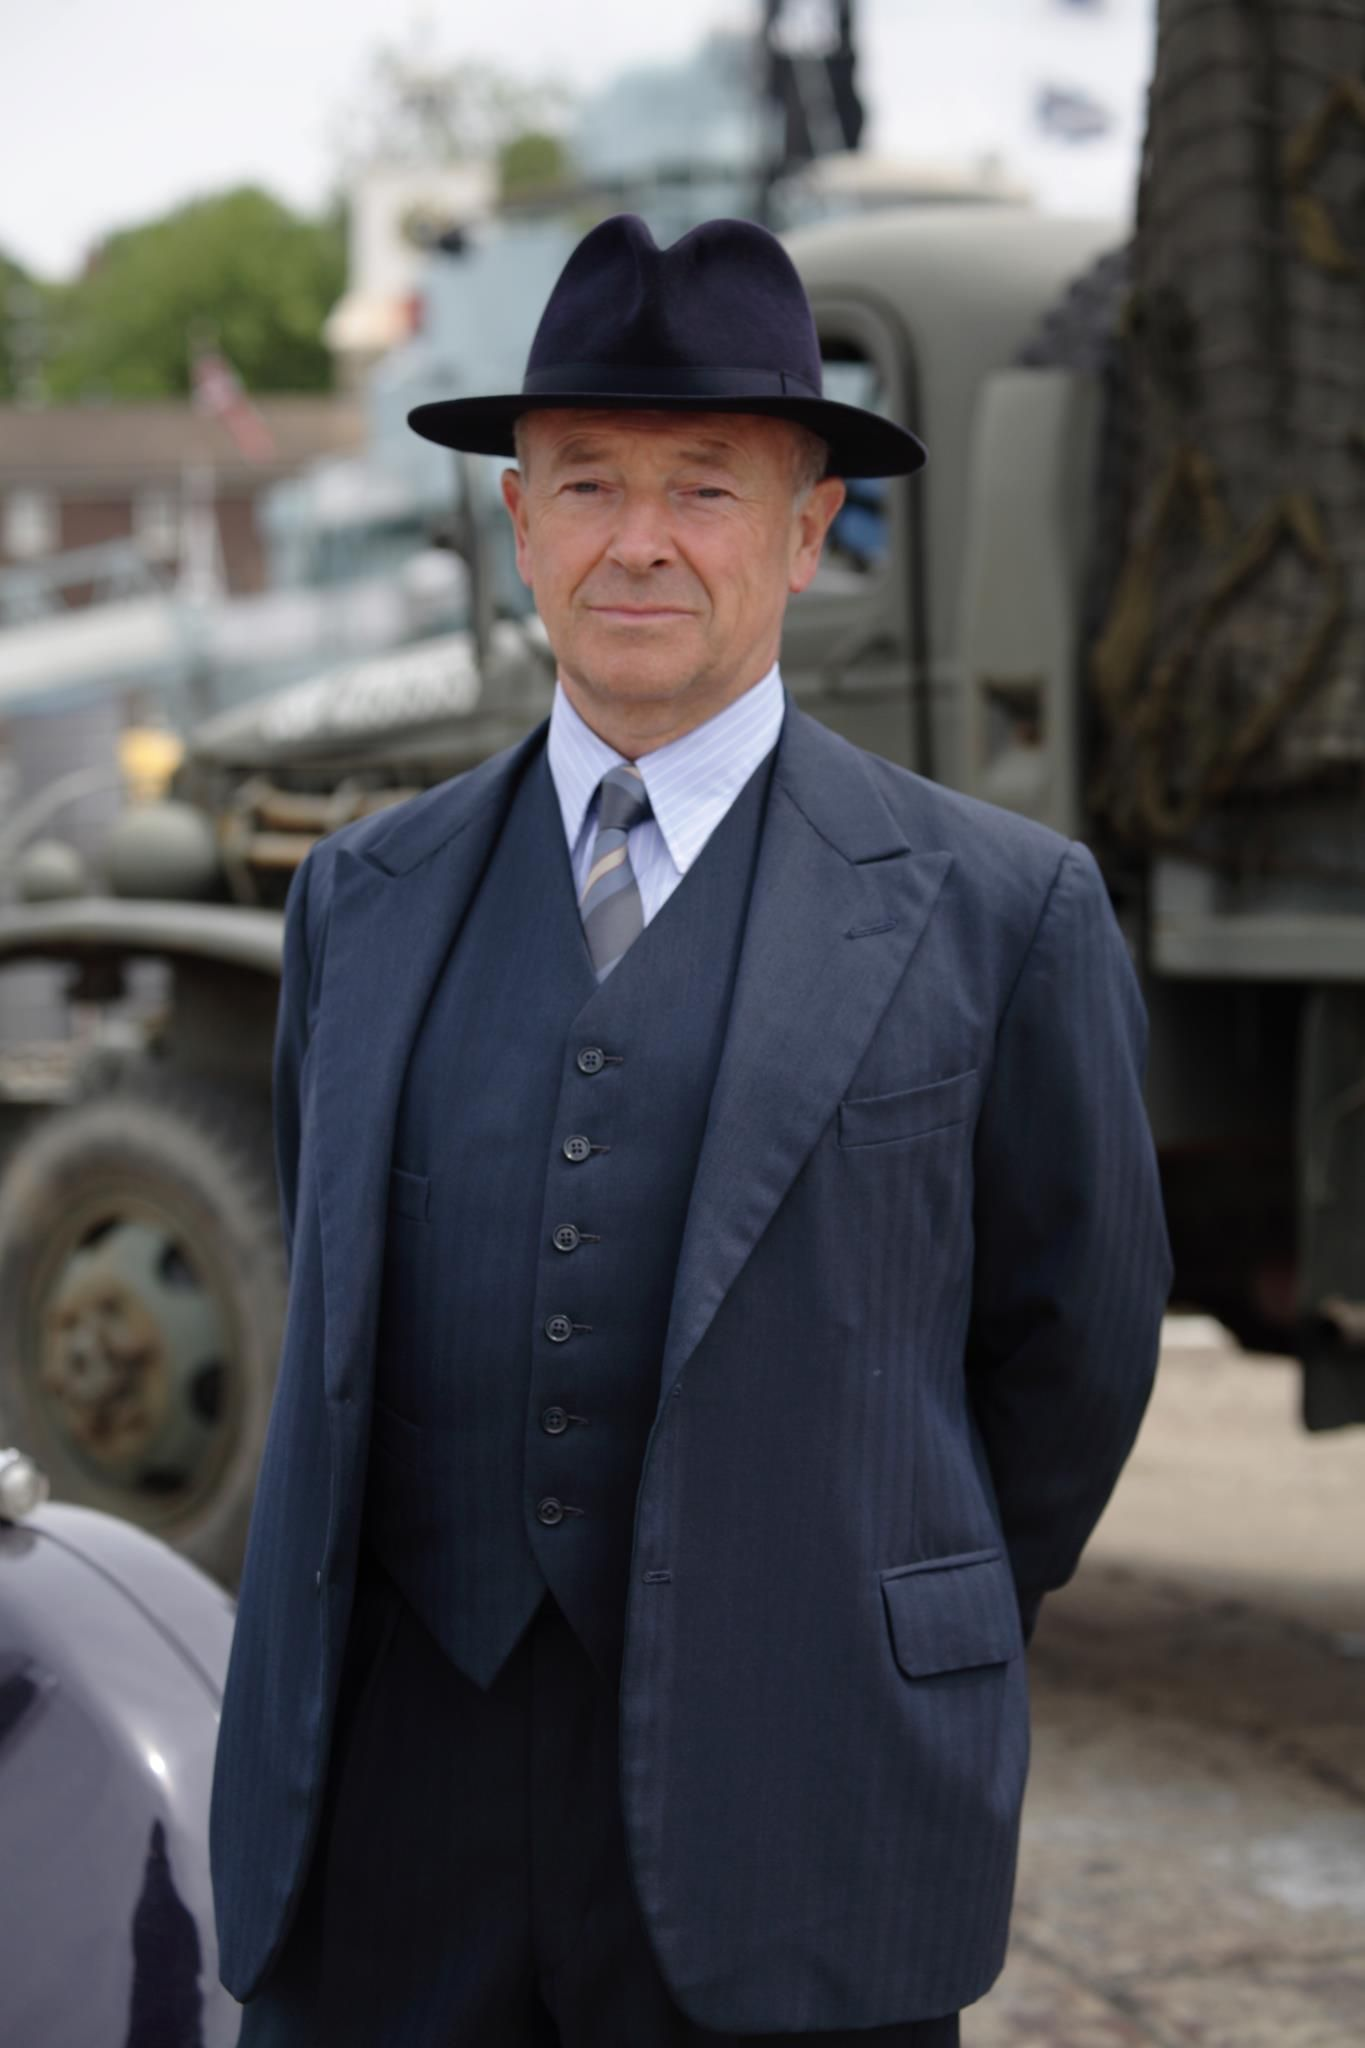 Michael Kitchen as Deputy Chief Superintendent Christopher